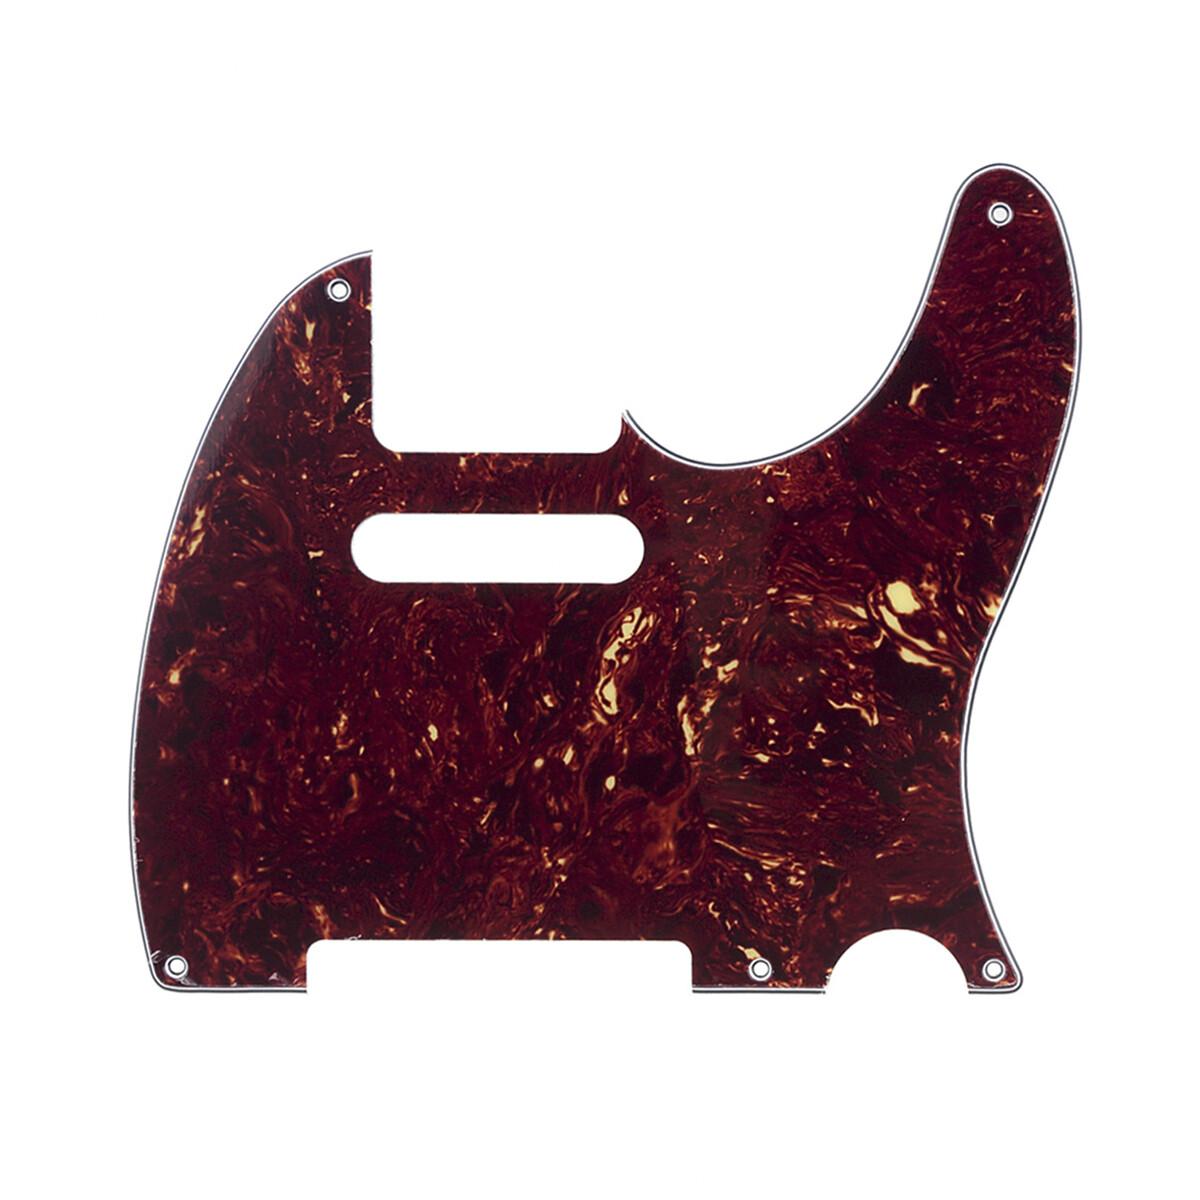 Brio 5 Hole Vintage Tele® Pickguard USA/Mexican Fender Standard Vintage Tortoise 4ply